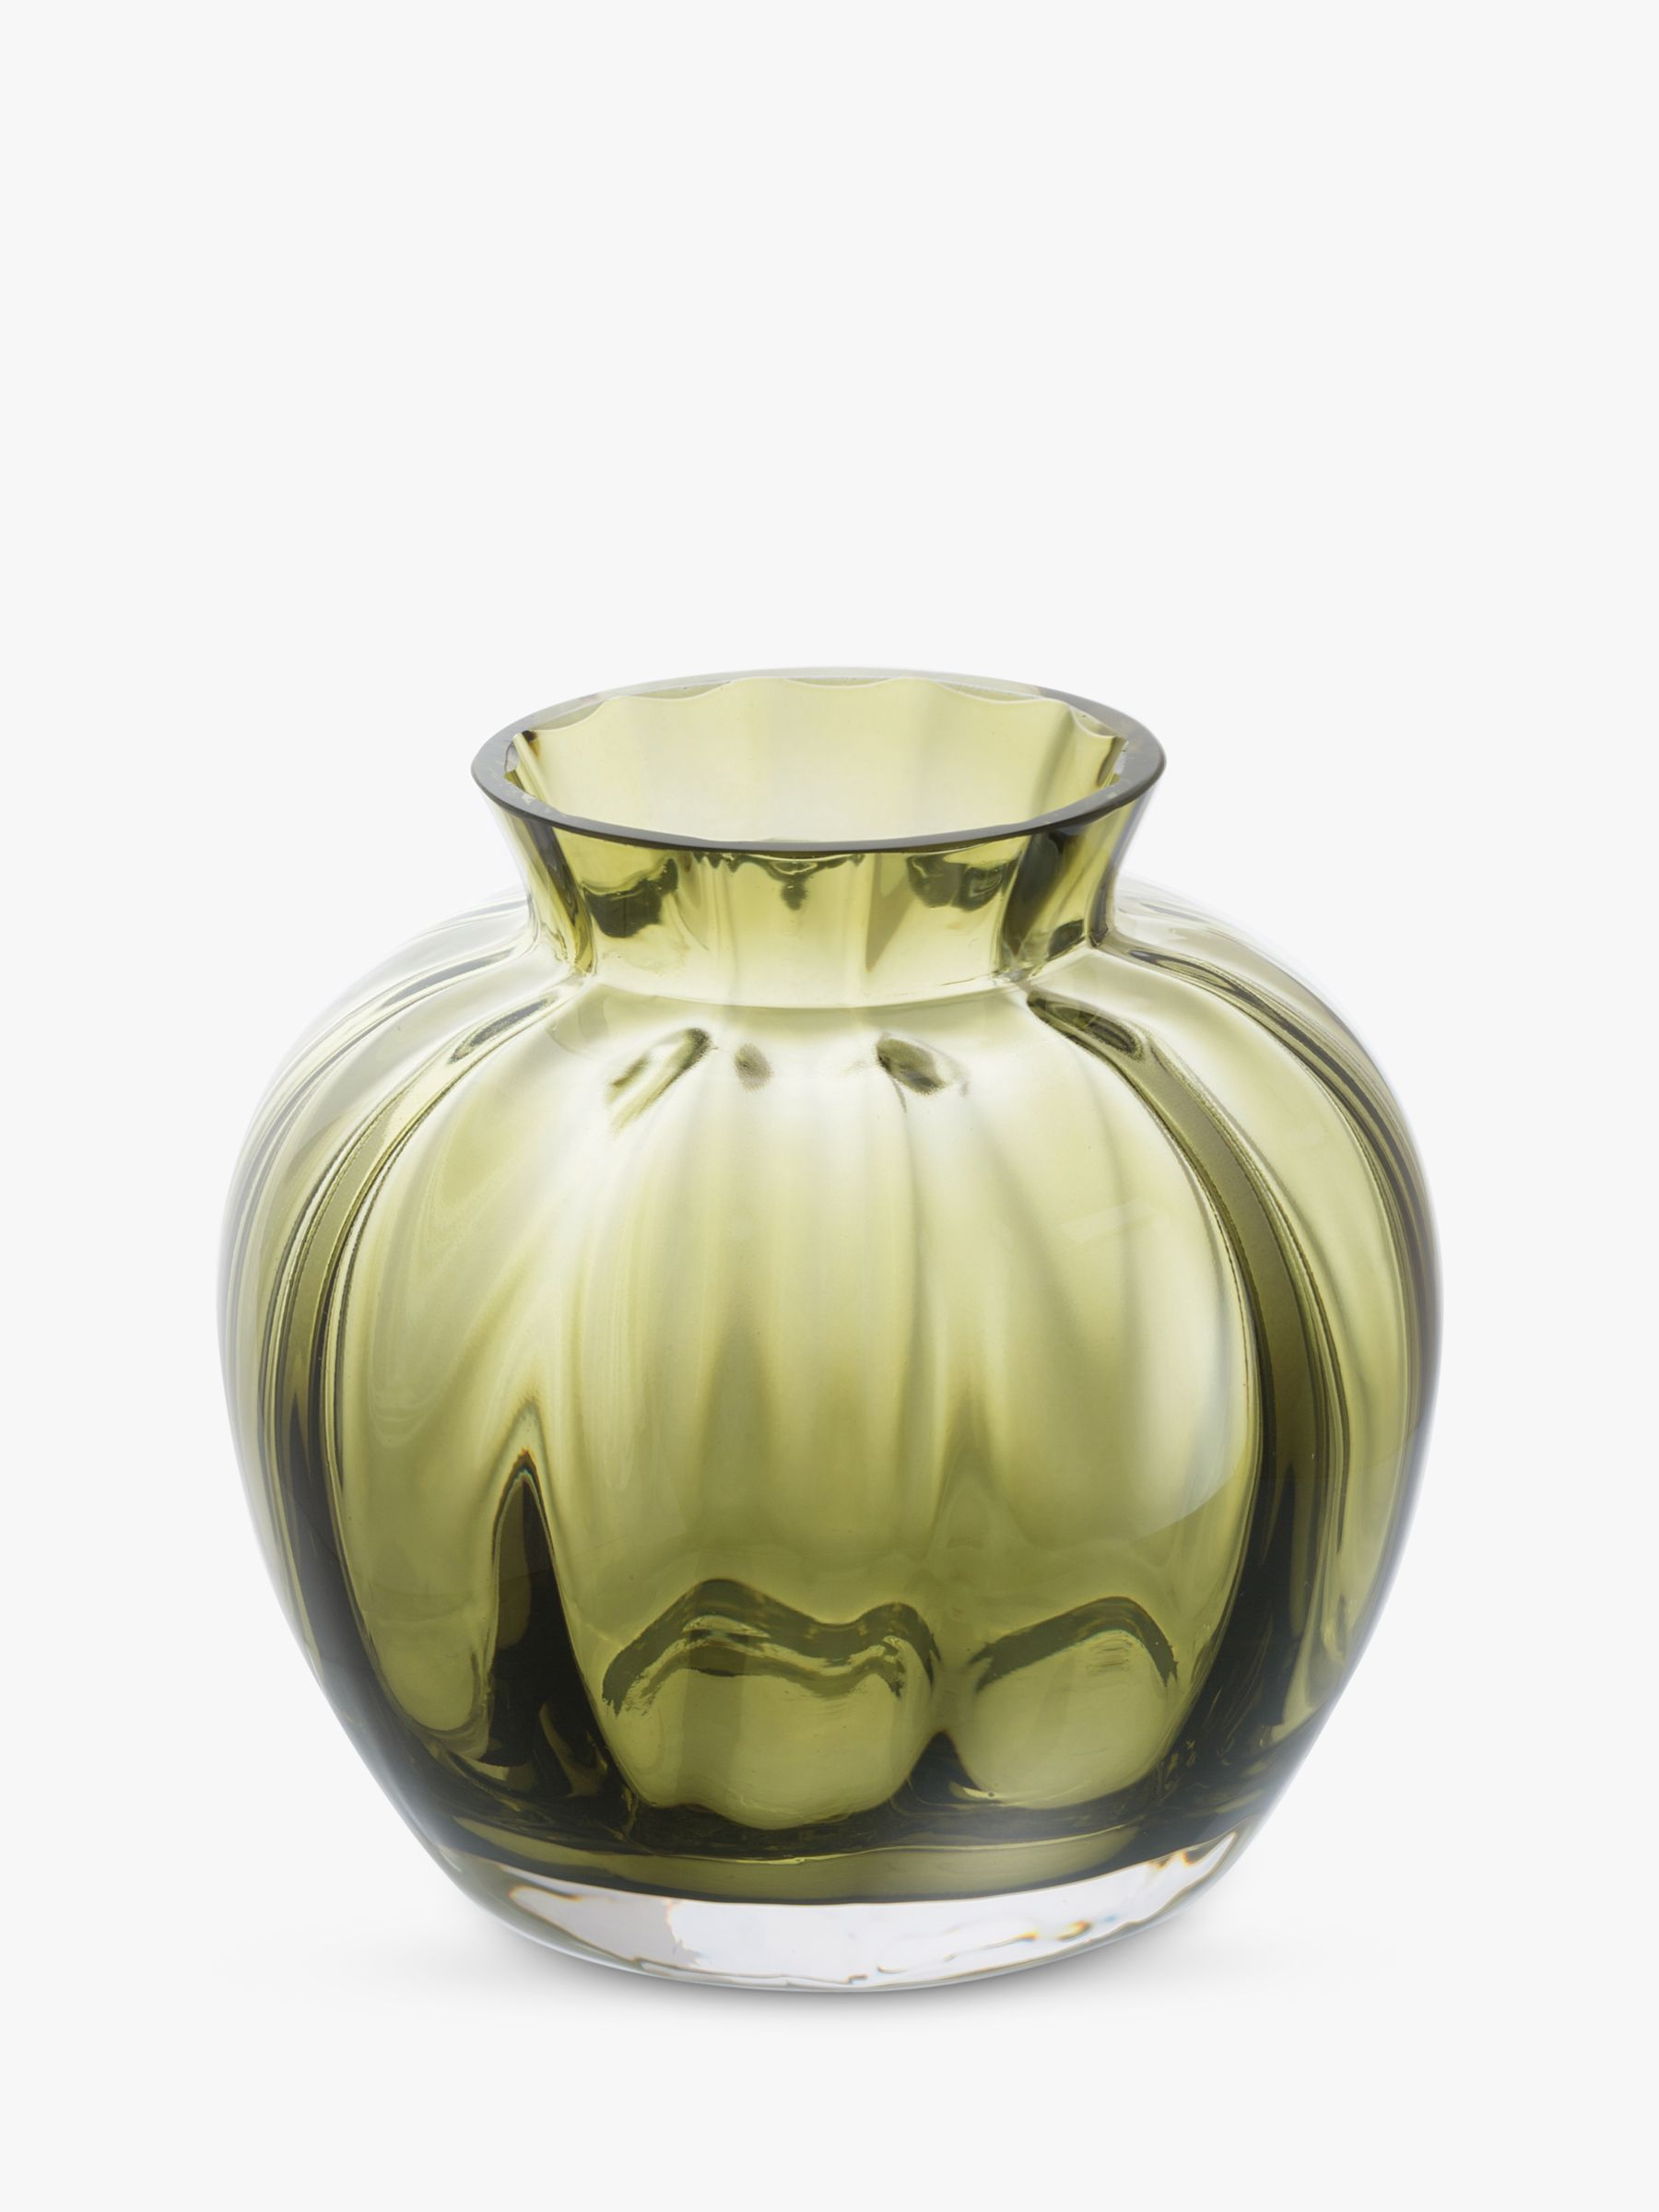 Dartington Crystal Dartington Crystal Little Treasures Posy Pot Vase, Olive